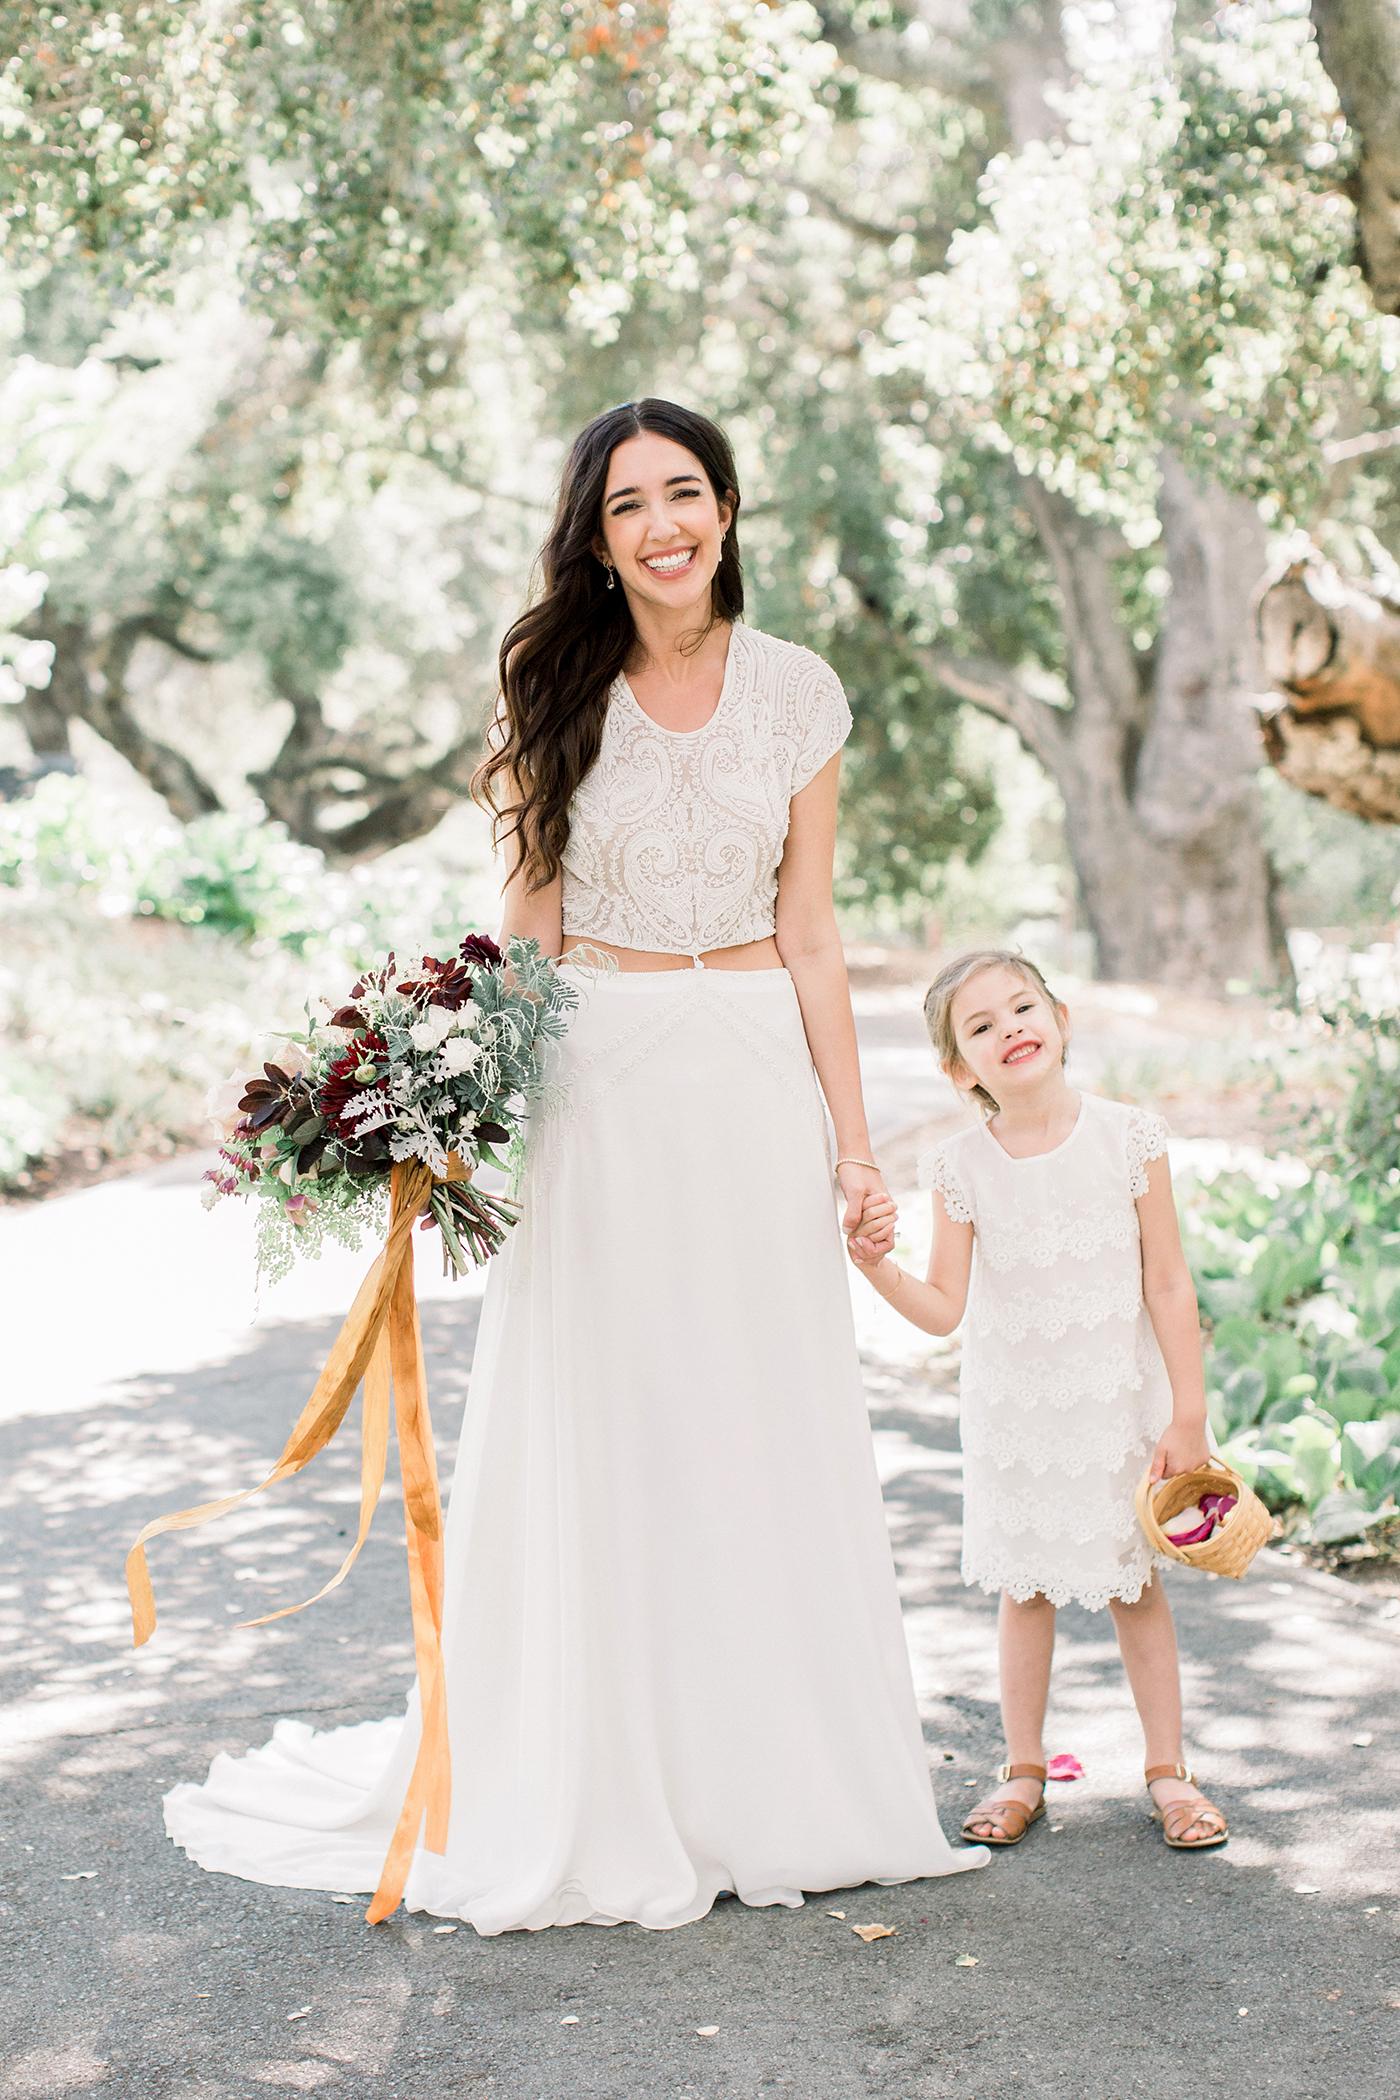 scalloped wedding decor bride and flower girl dress